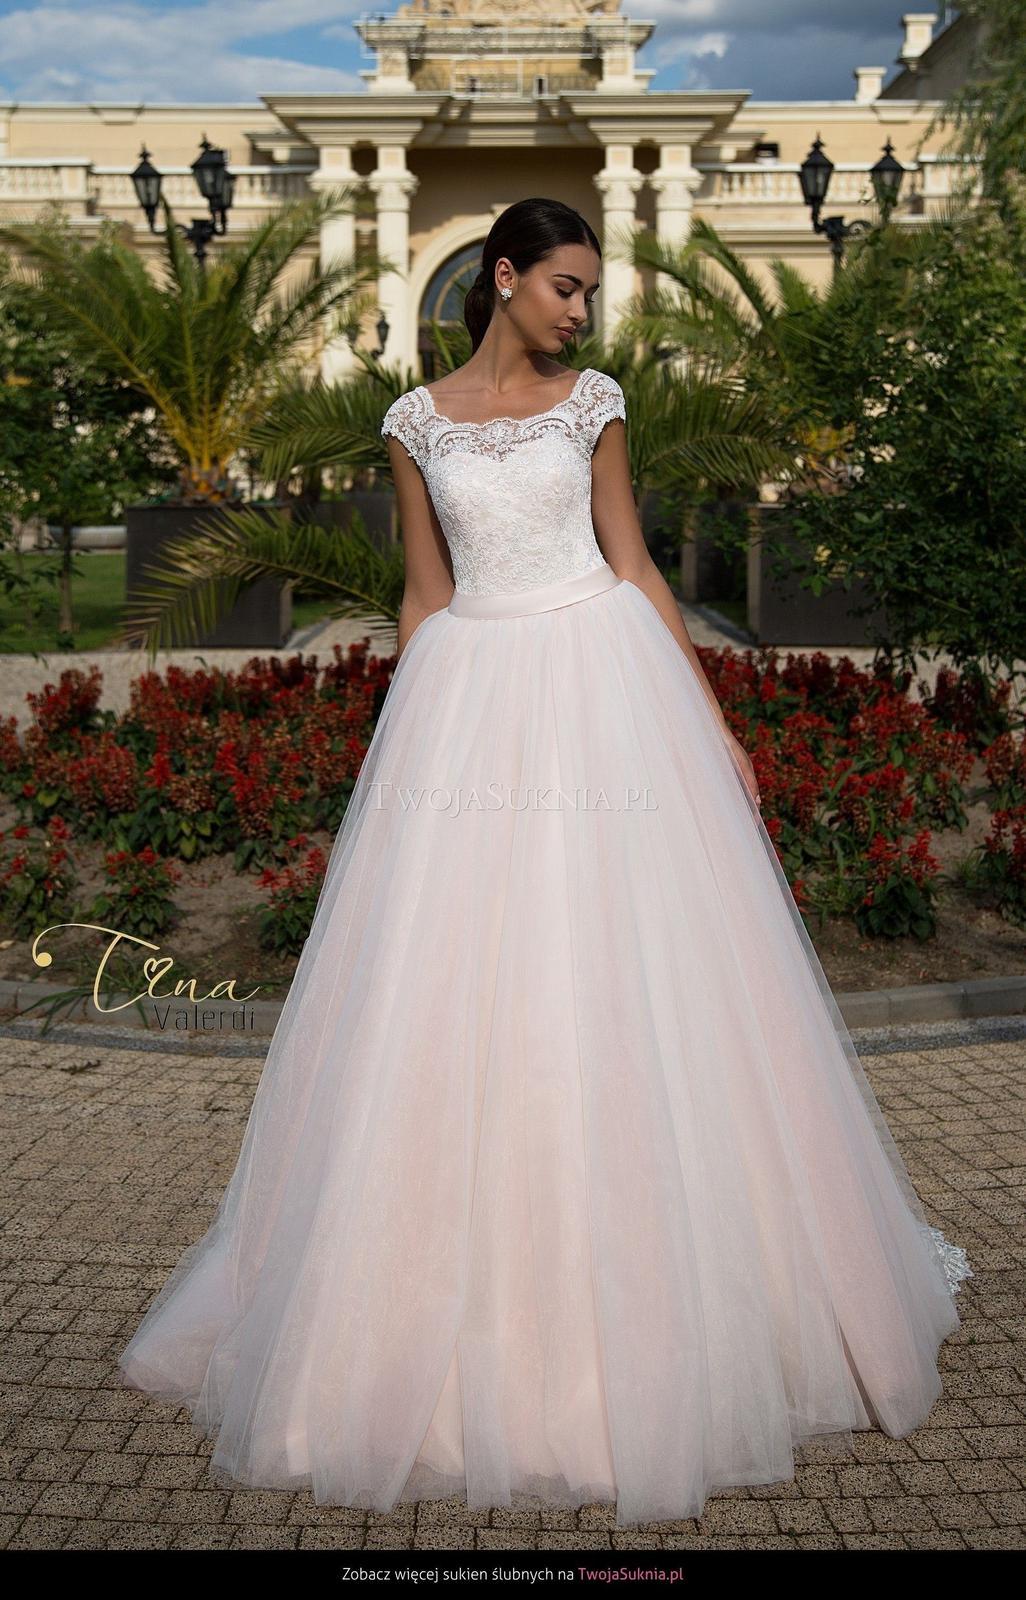 Šaty Tina Valerdi svetloružové  - Obrázok č. 3